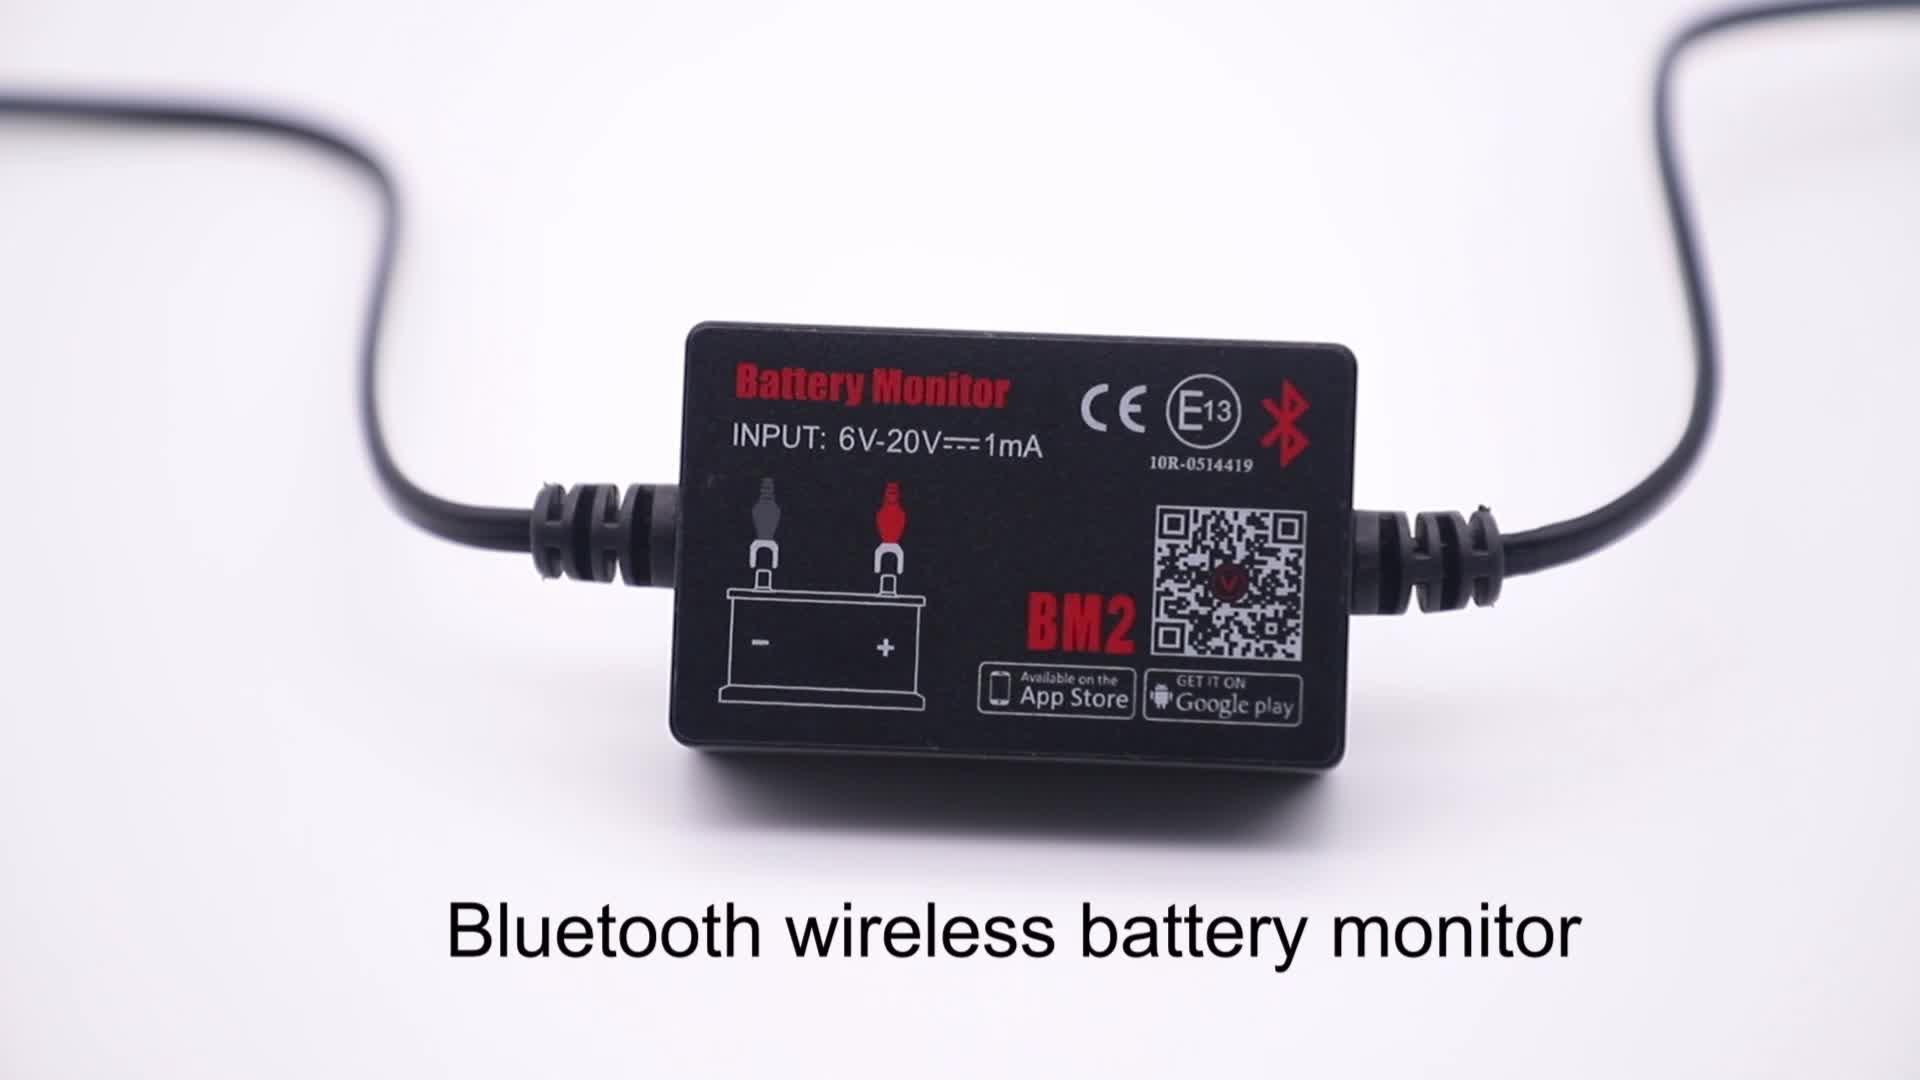 मिनी स्मार्ट मोटर वाहन ब्लूटूथ वाहन बैटरी मॉनिटर bm2 कार ब्लूटूथ परीक्षक बैटरी कार